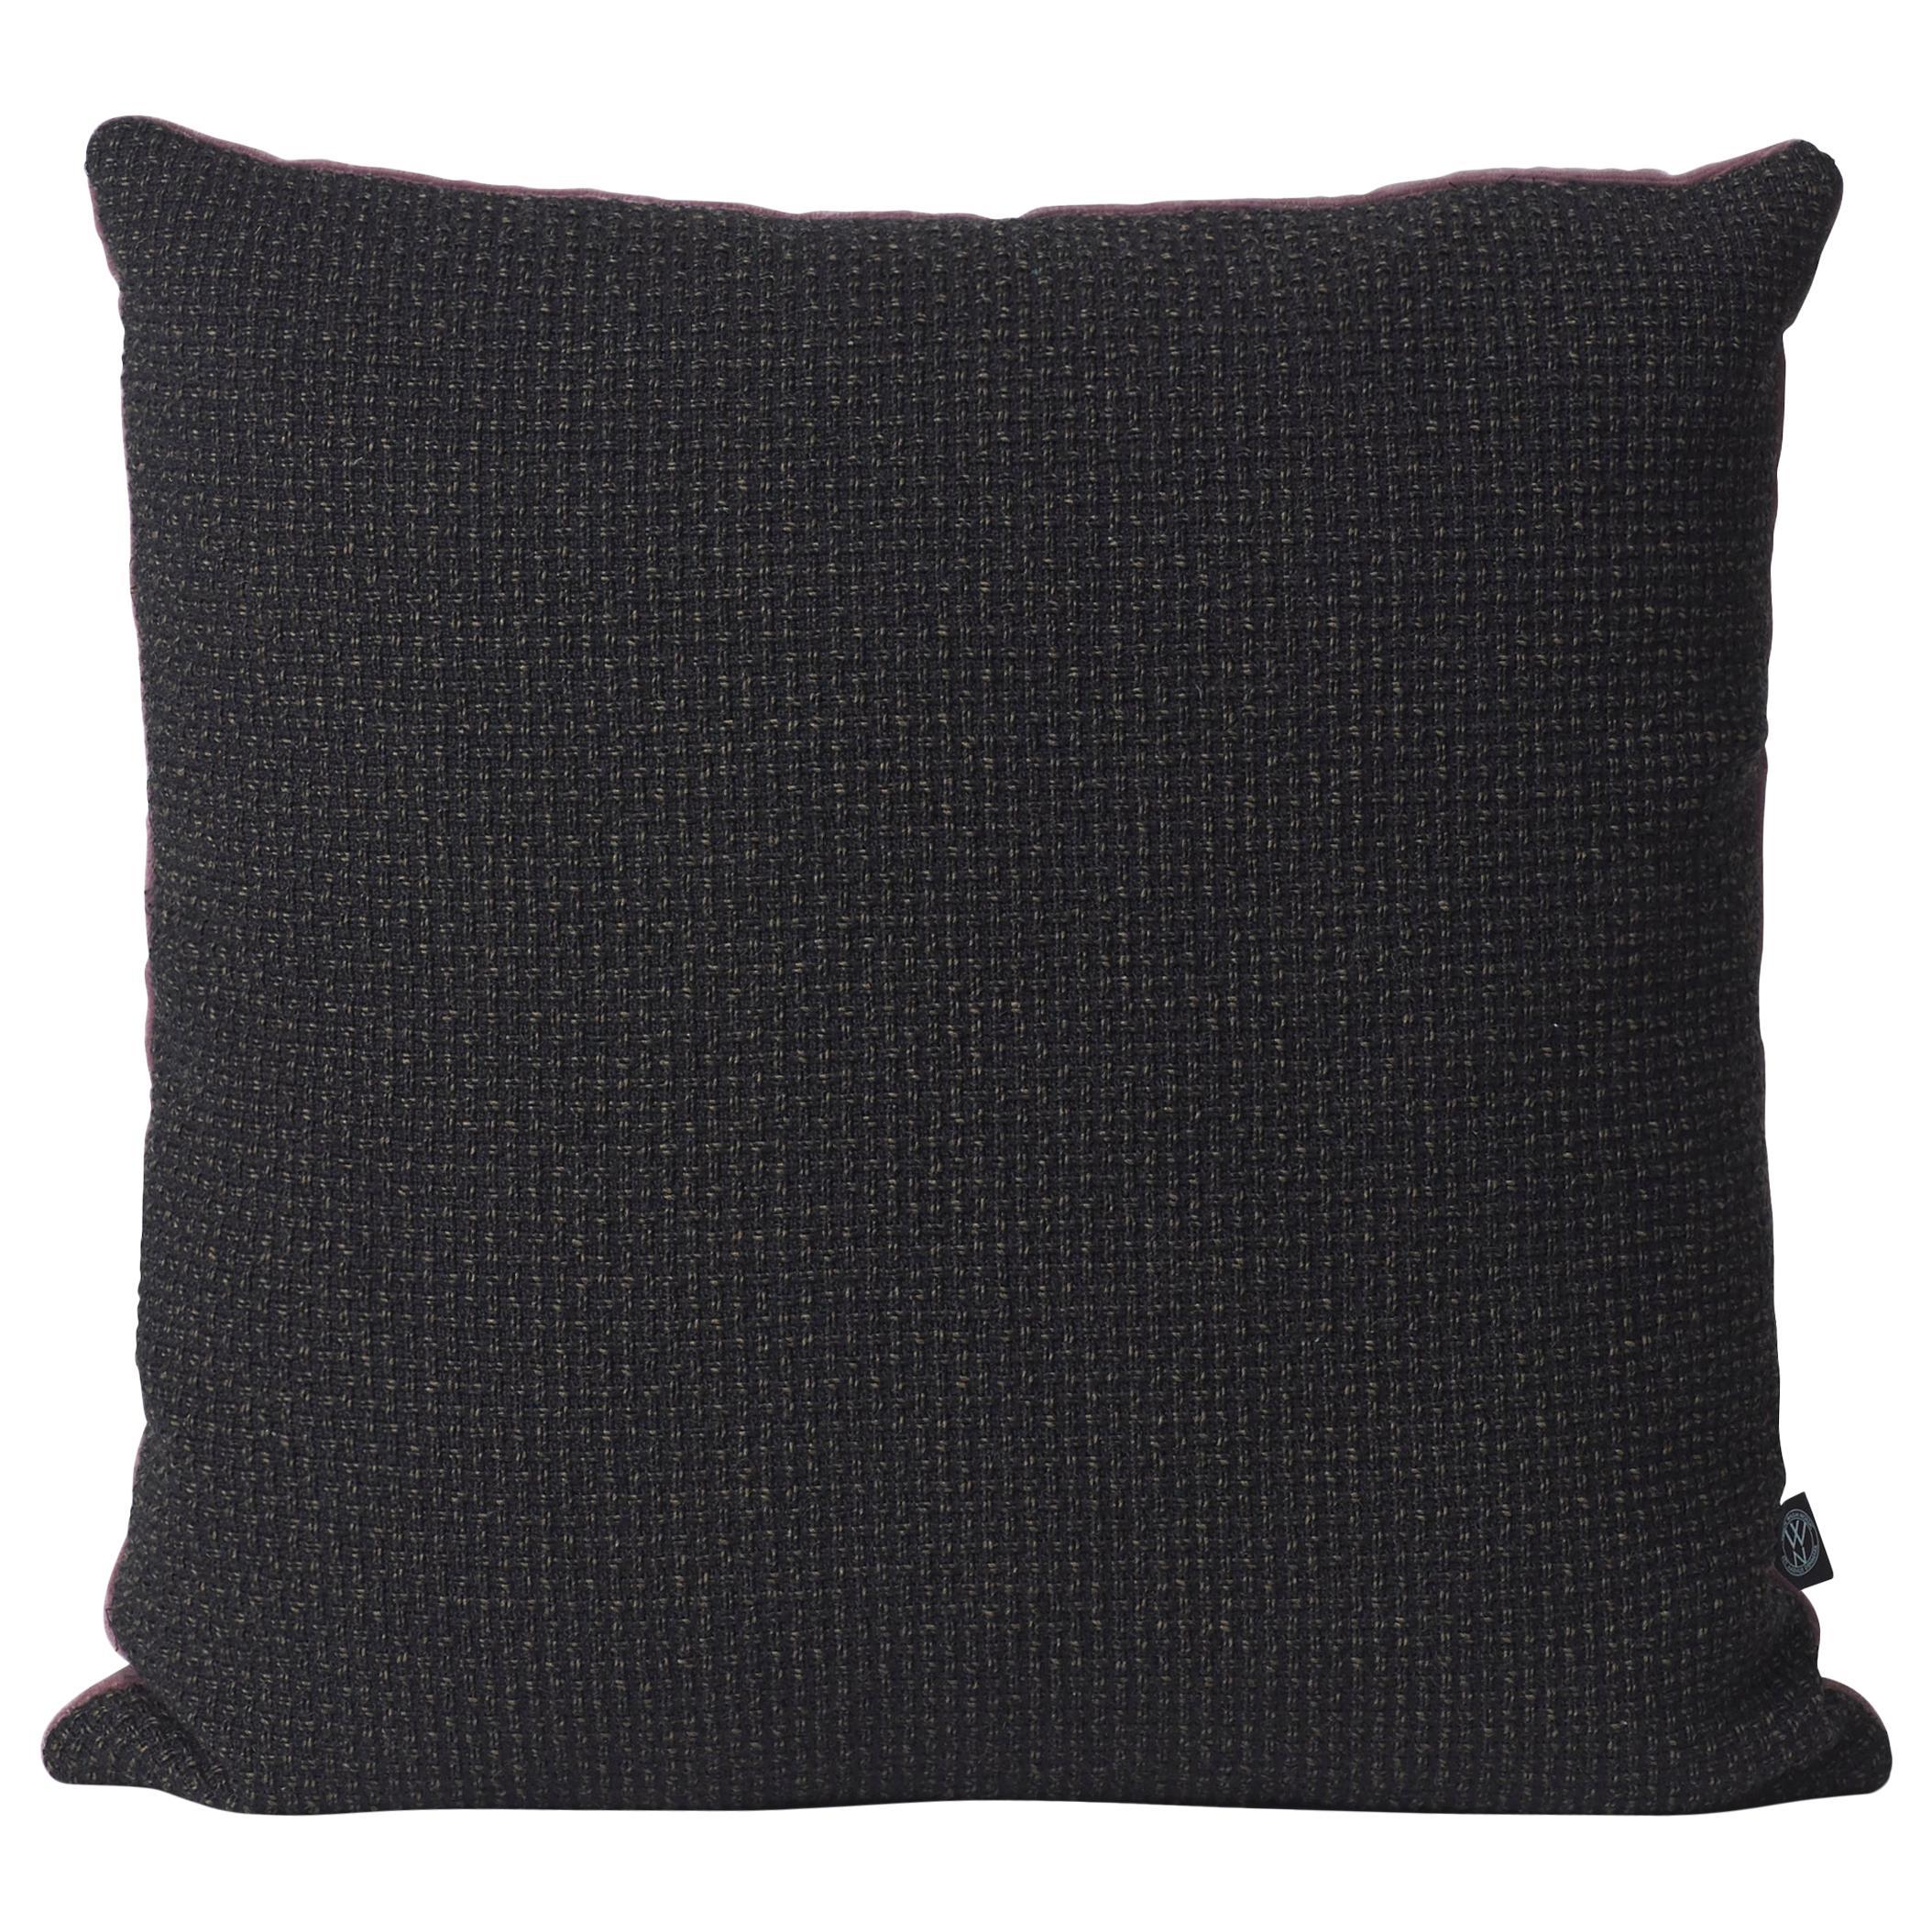 Moodify Square Cushion, by Warm Nordic